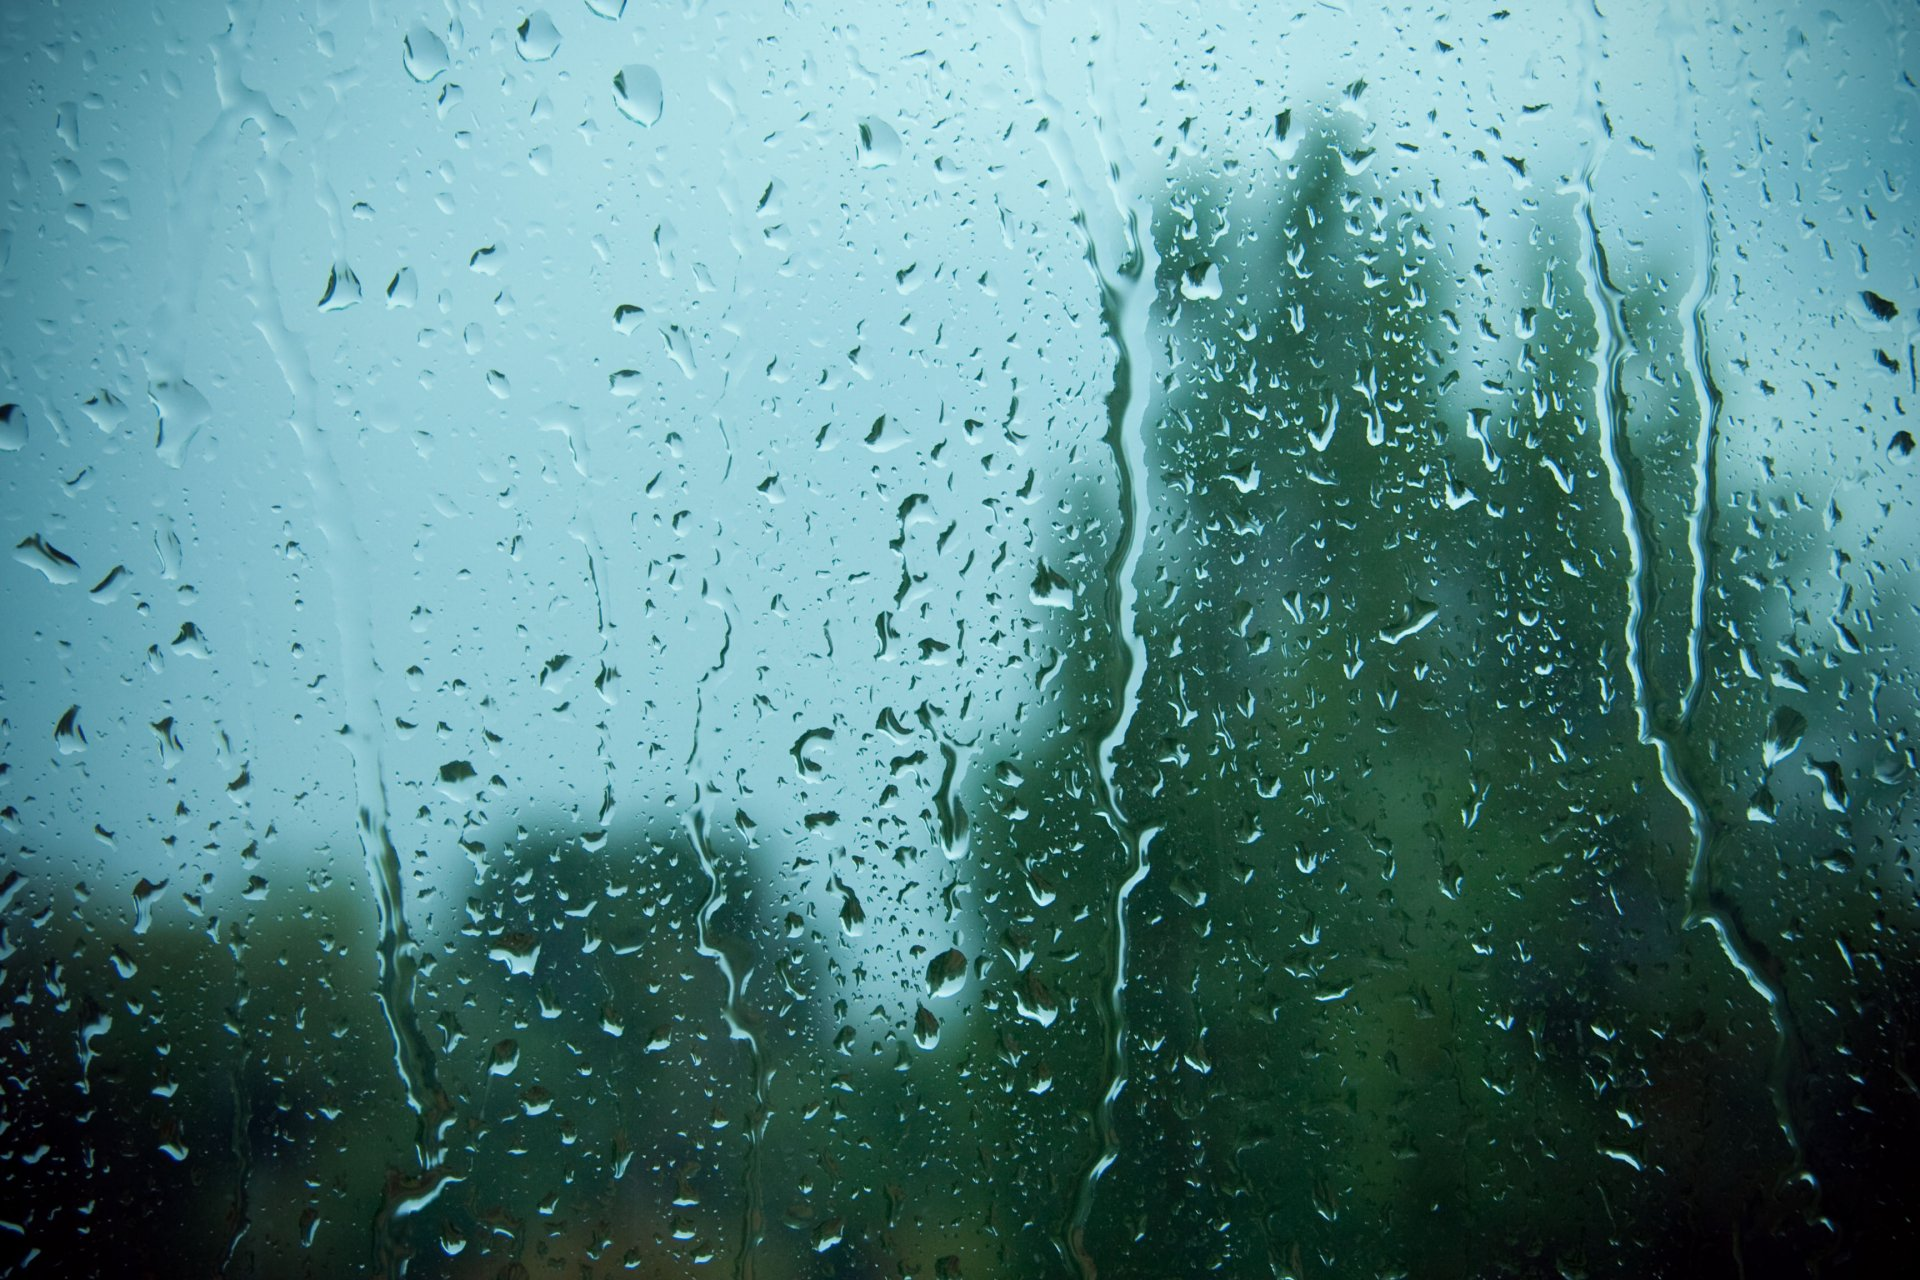 Картинки про дождь на стекле